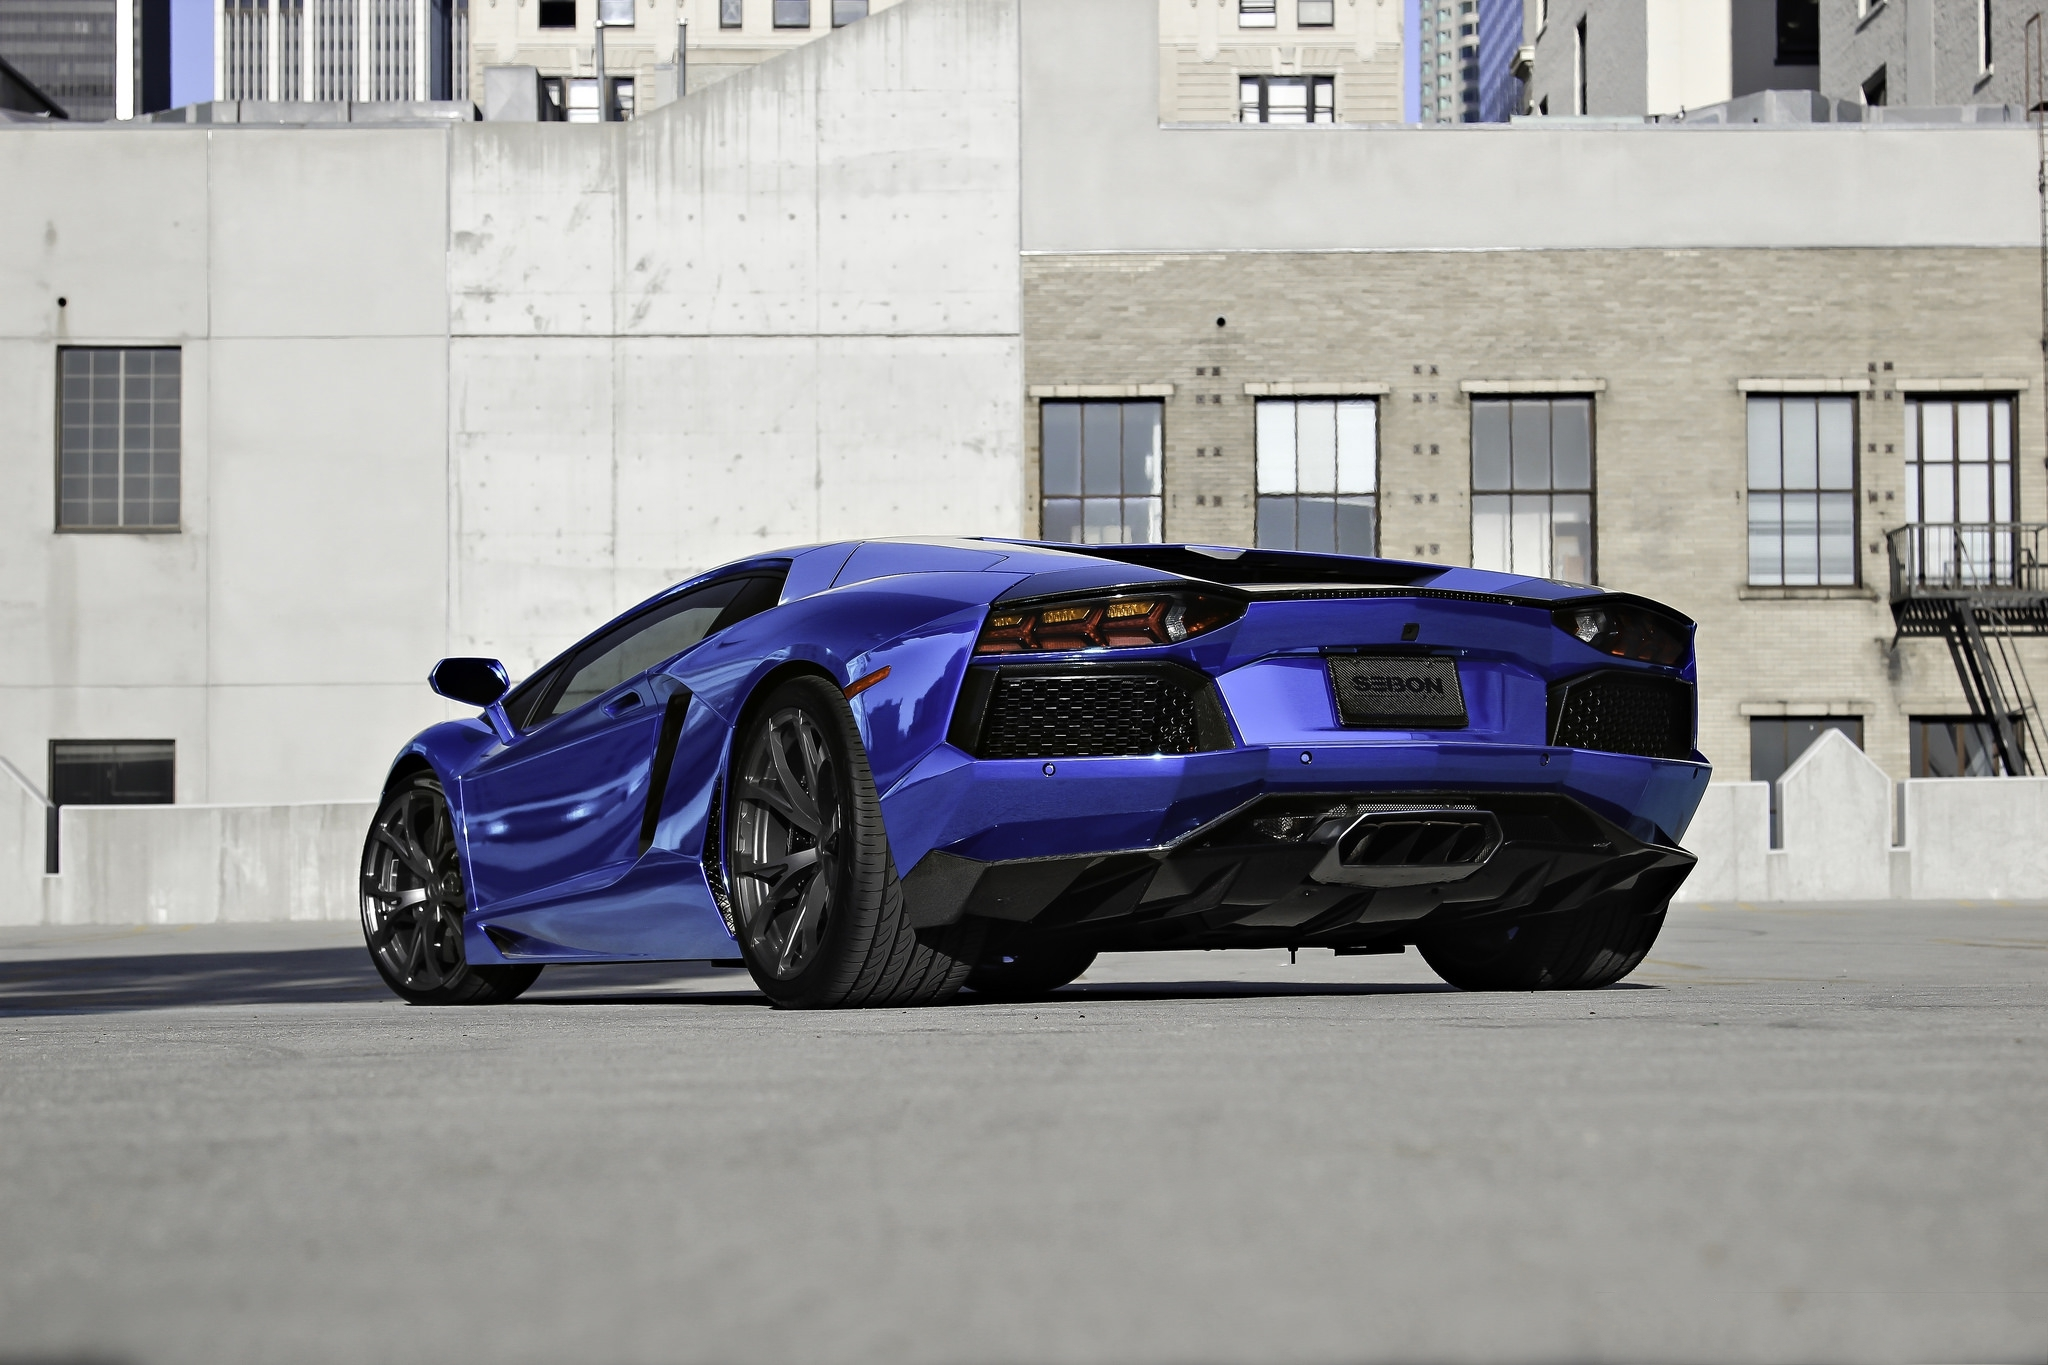 120805 download wallpaper Lamborghini, Cars, Aventador, Lp700-4 screensavers and pictures for free